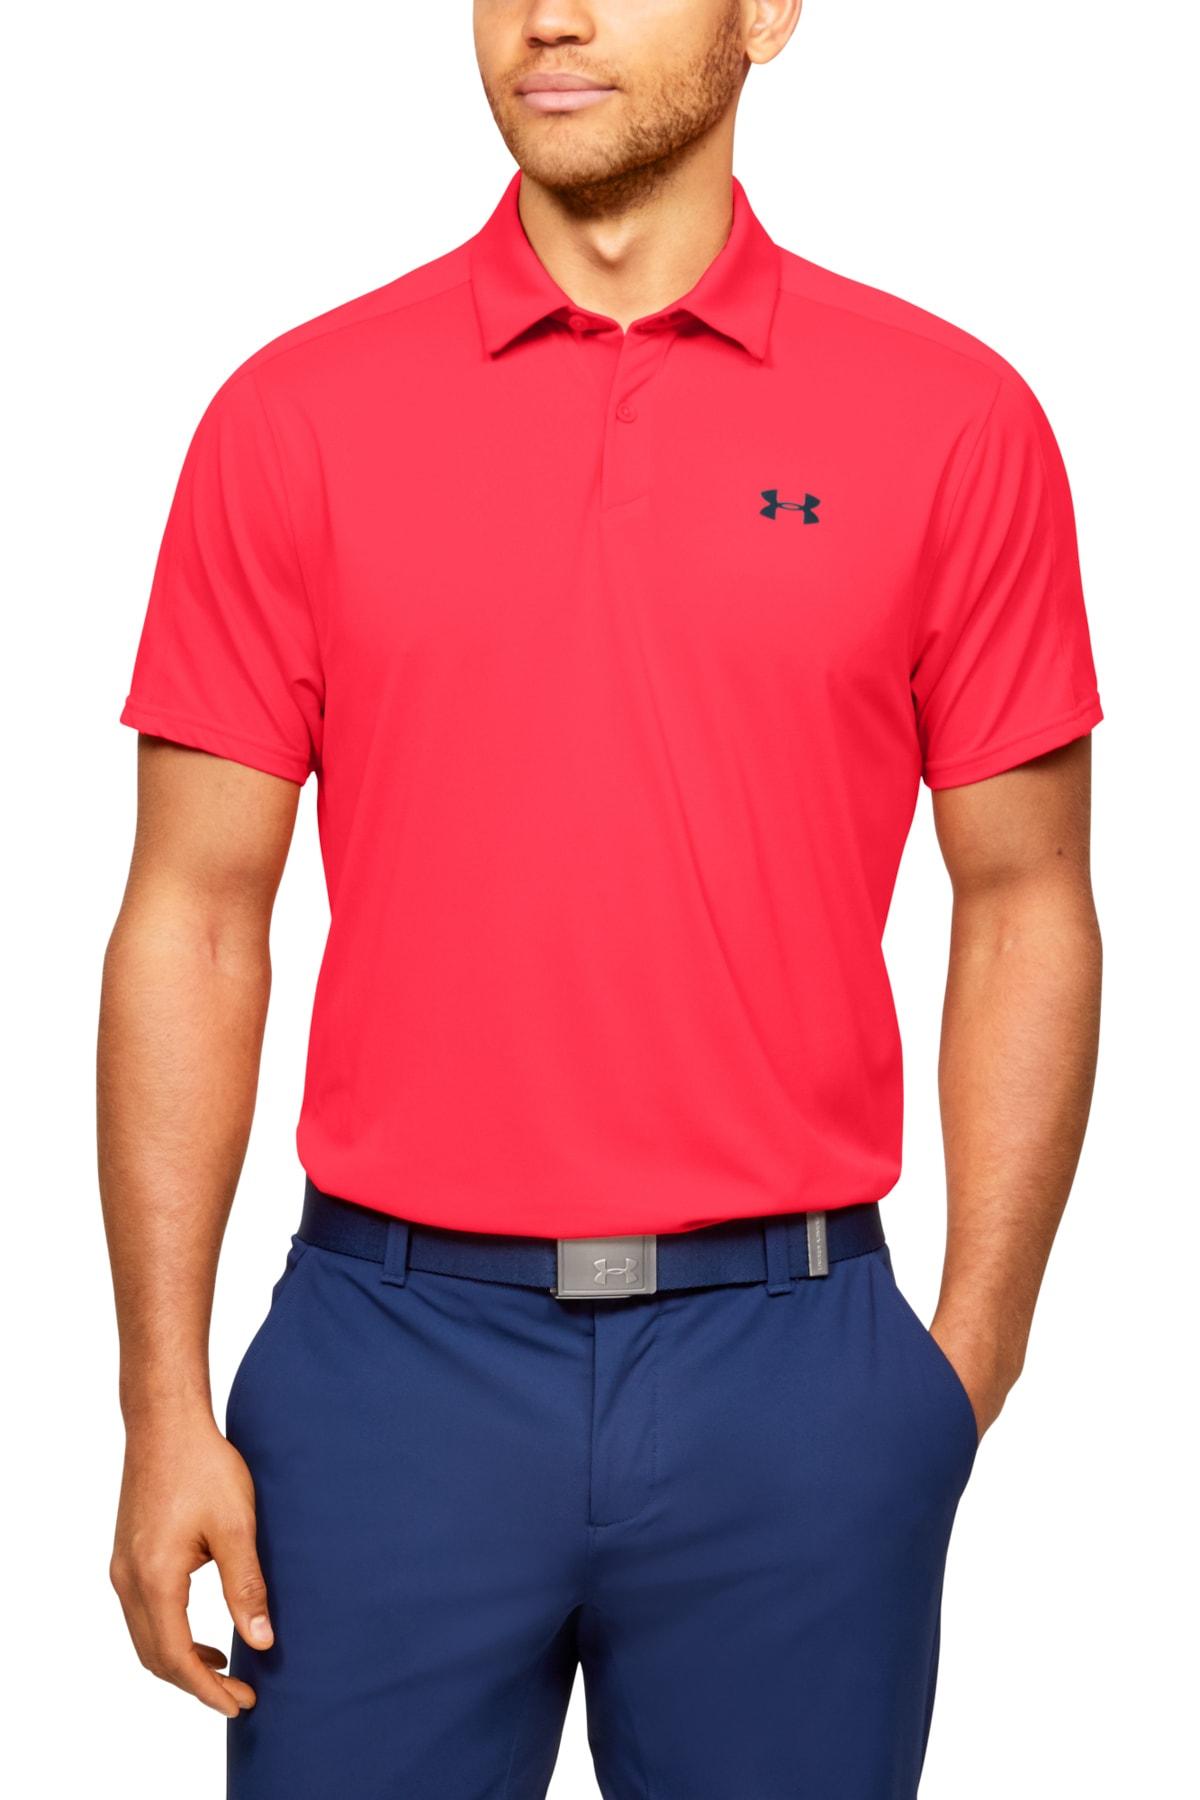 Under Armour Erkek Spor T-Shirt - UA Vanish Polo - 1350035-628 1